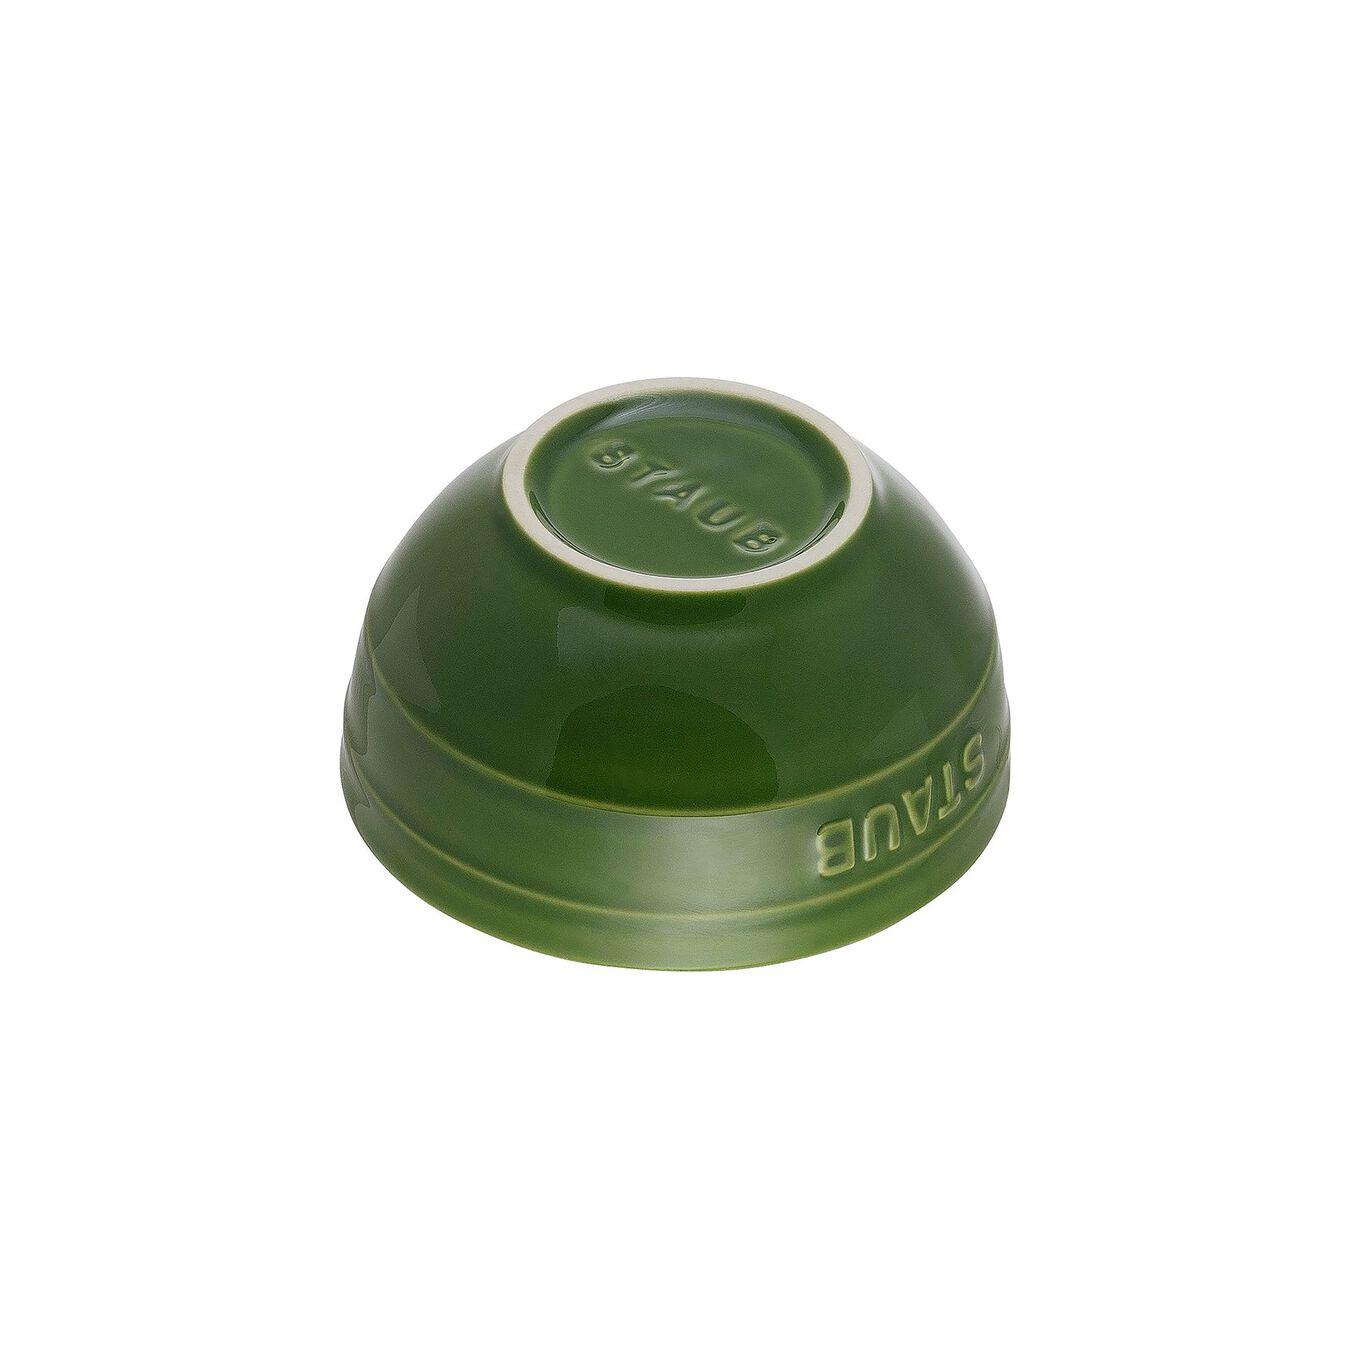 4.75-inch Small Universal Bowl - Basil,,large 2